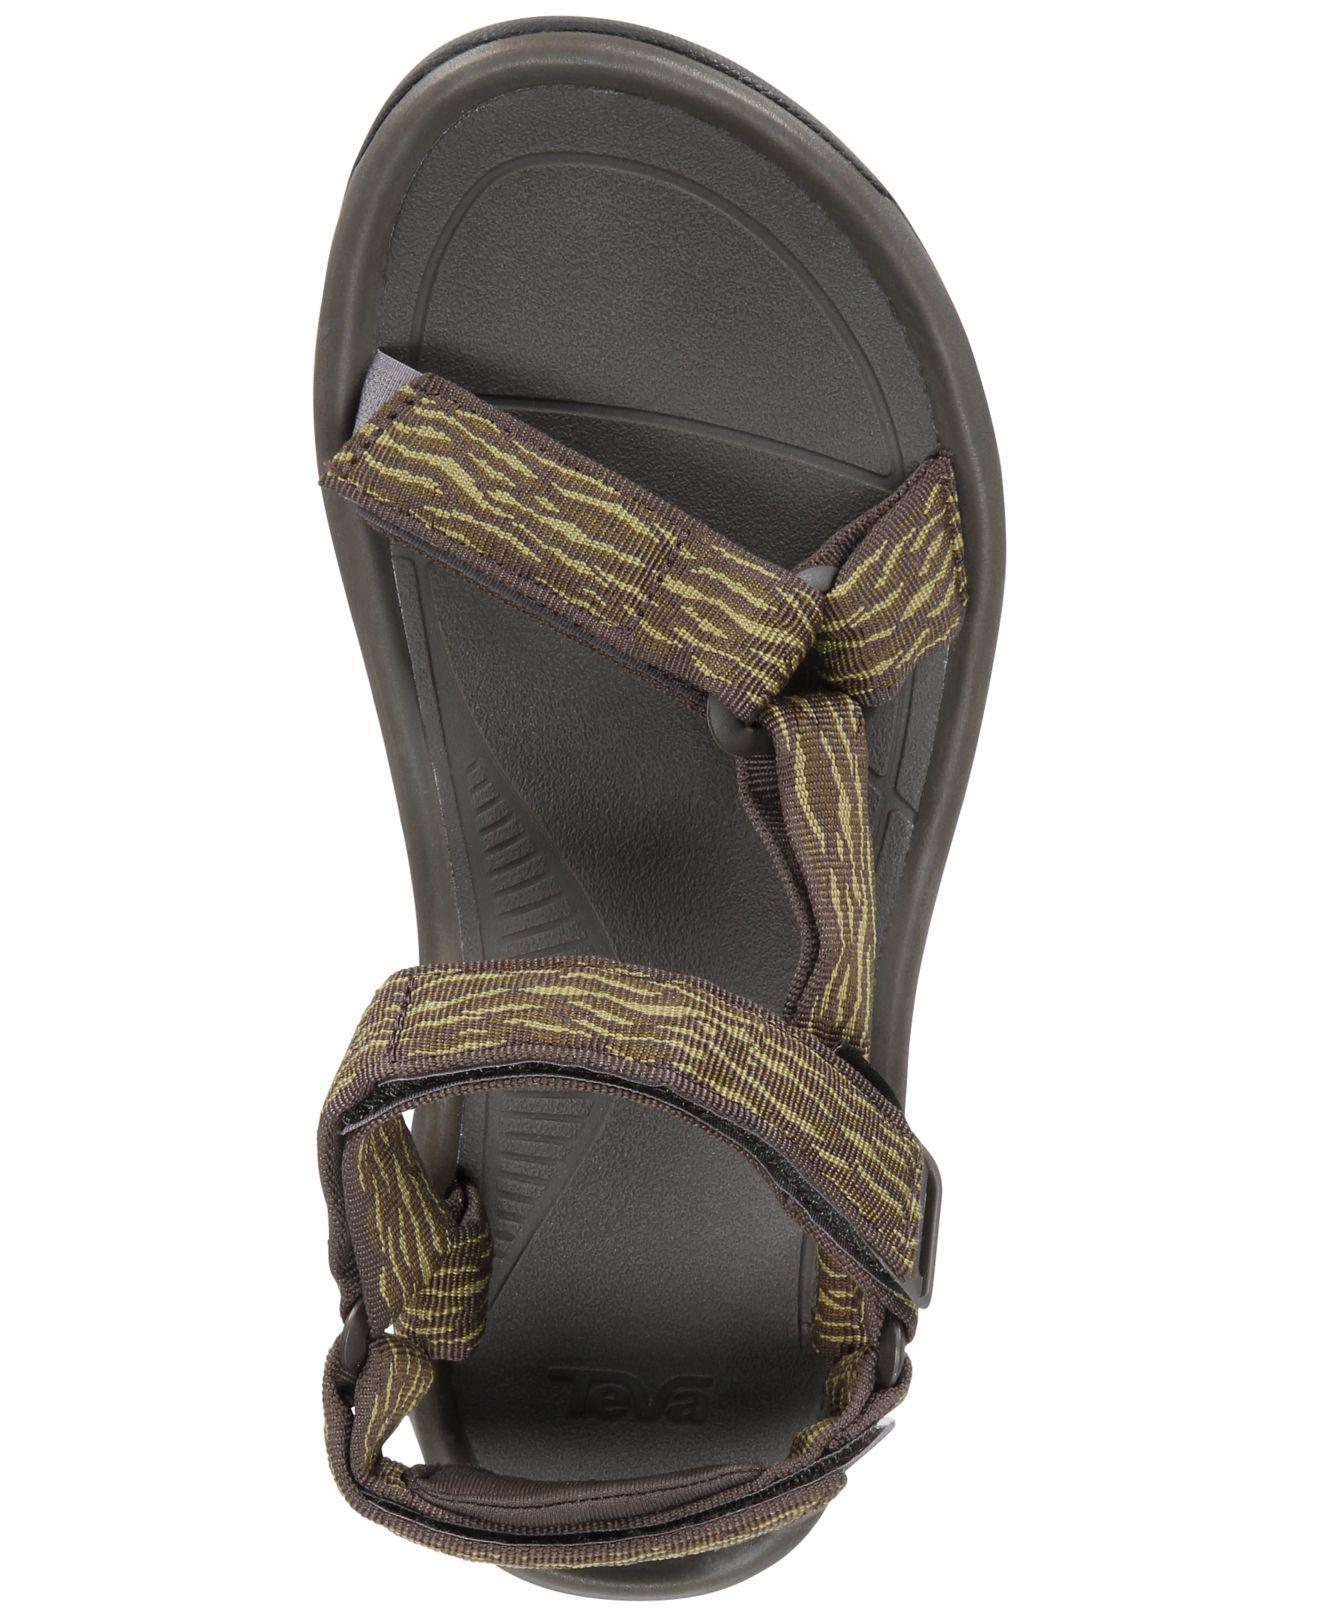 8252db0501d95 Teva - Black Hurricane Xlt2 Water-resistant Sandals for Men - Lyst. View  fullscreen